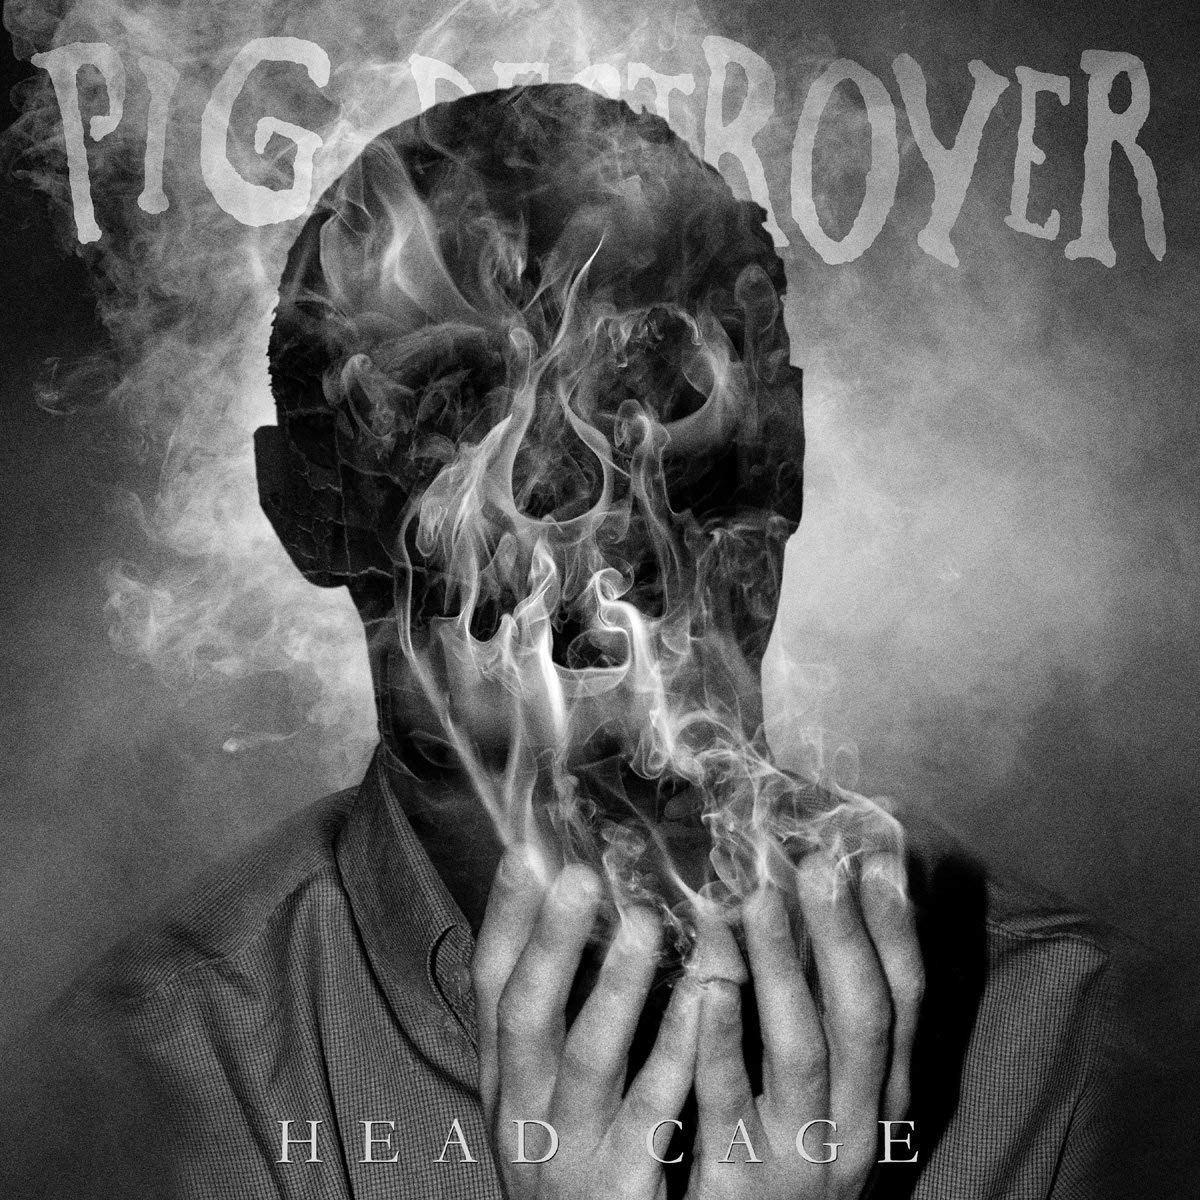 pig-destroyer-head-cage-relapse.jpg